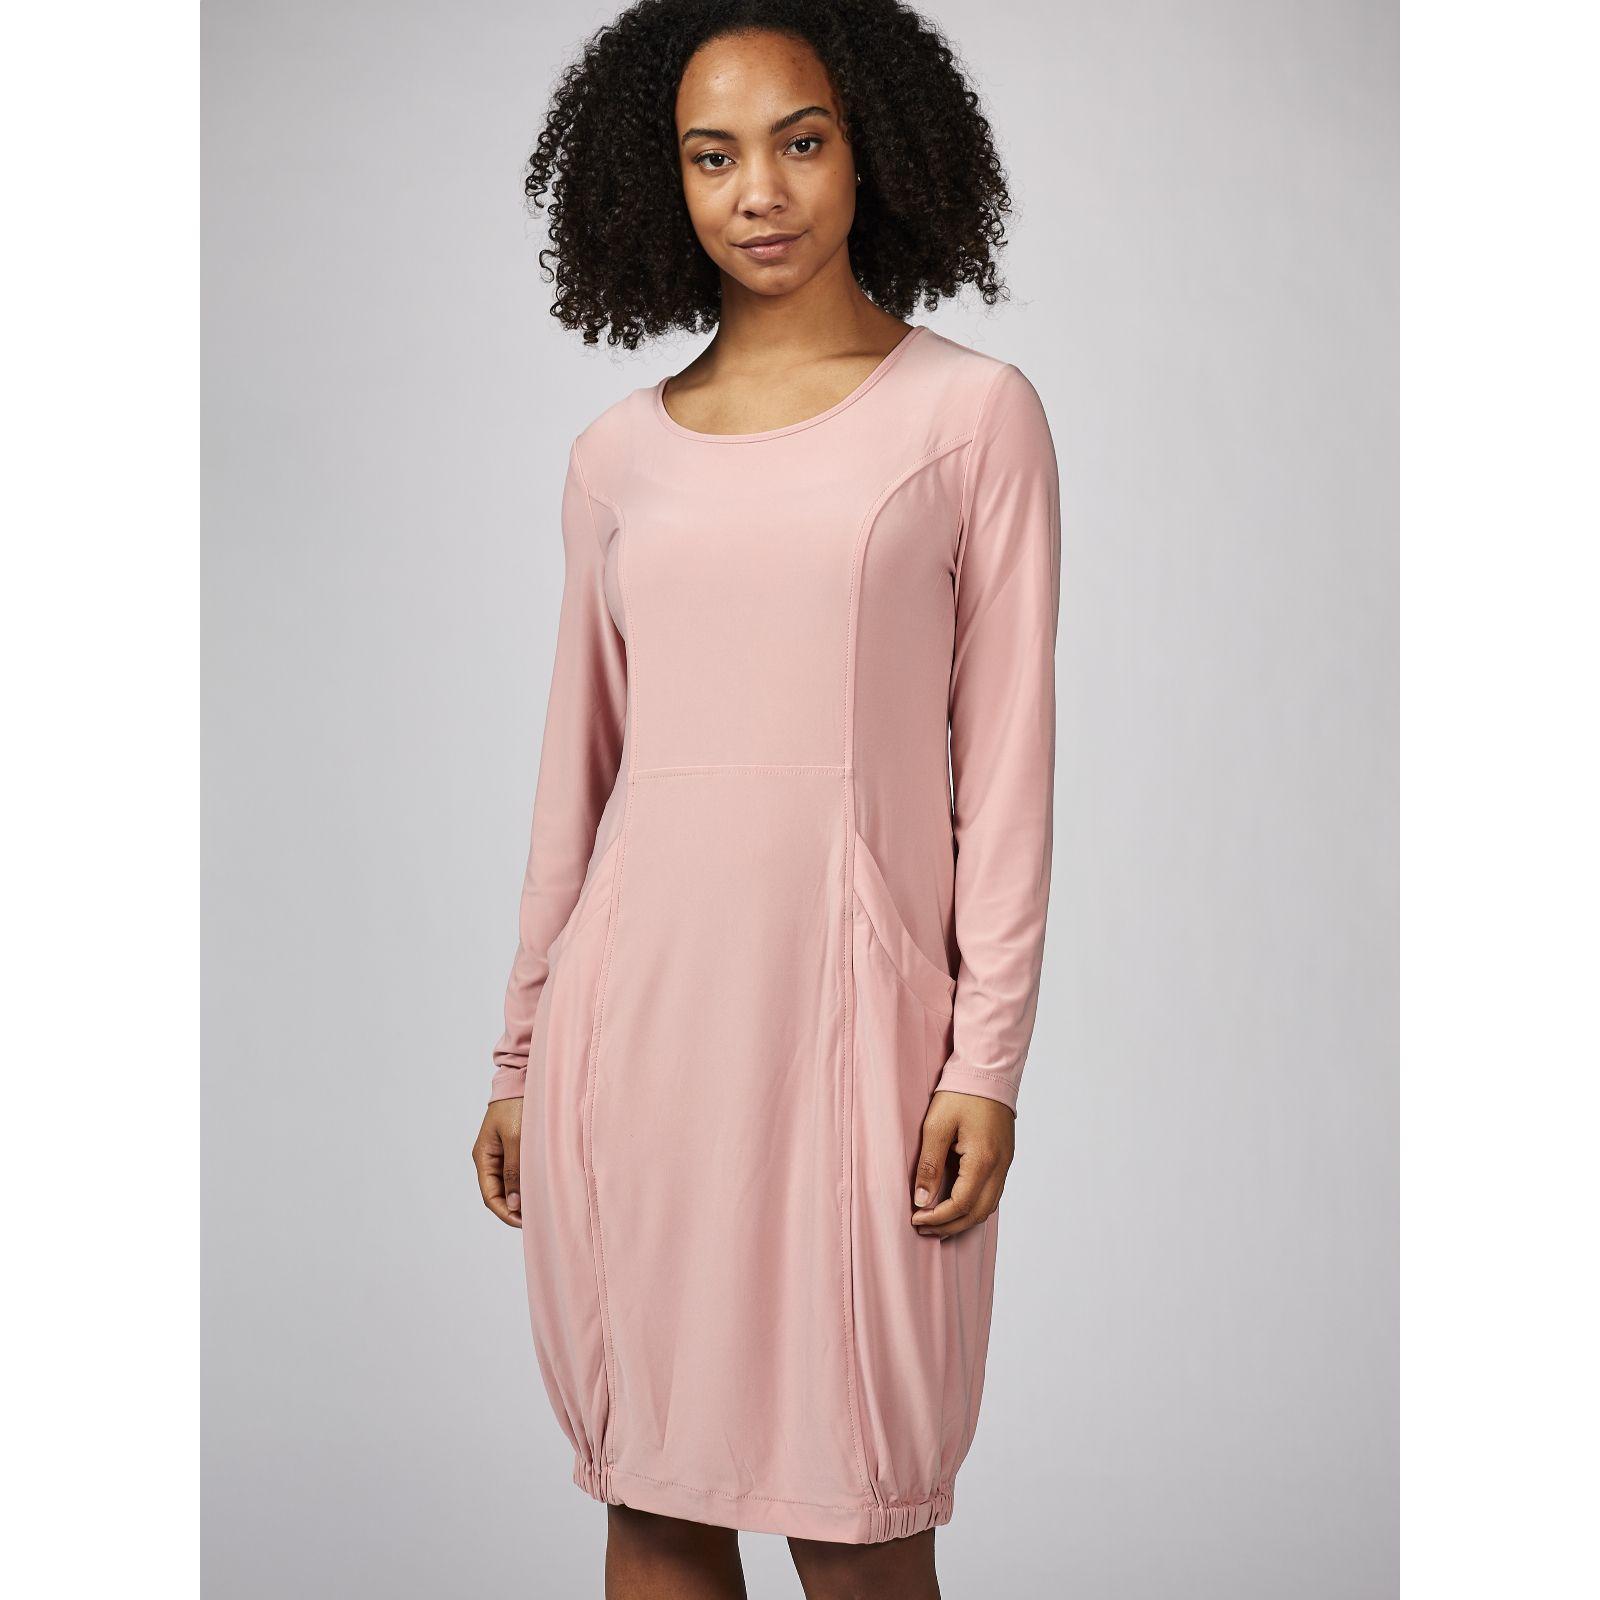 ae3f6665e12 Long Sleeve Dress with Elasticated Hem   Front Pockets by Nina ...